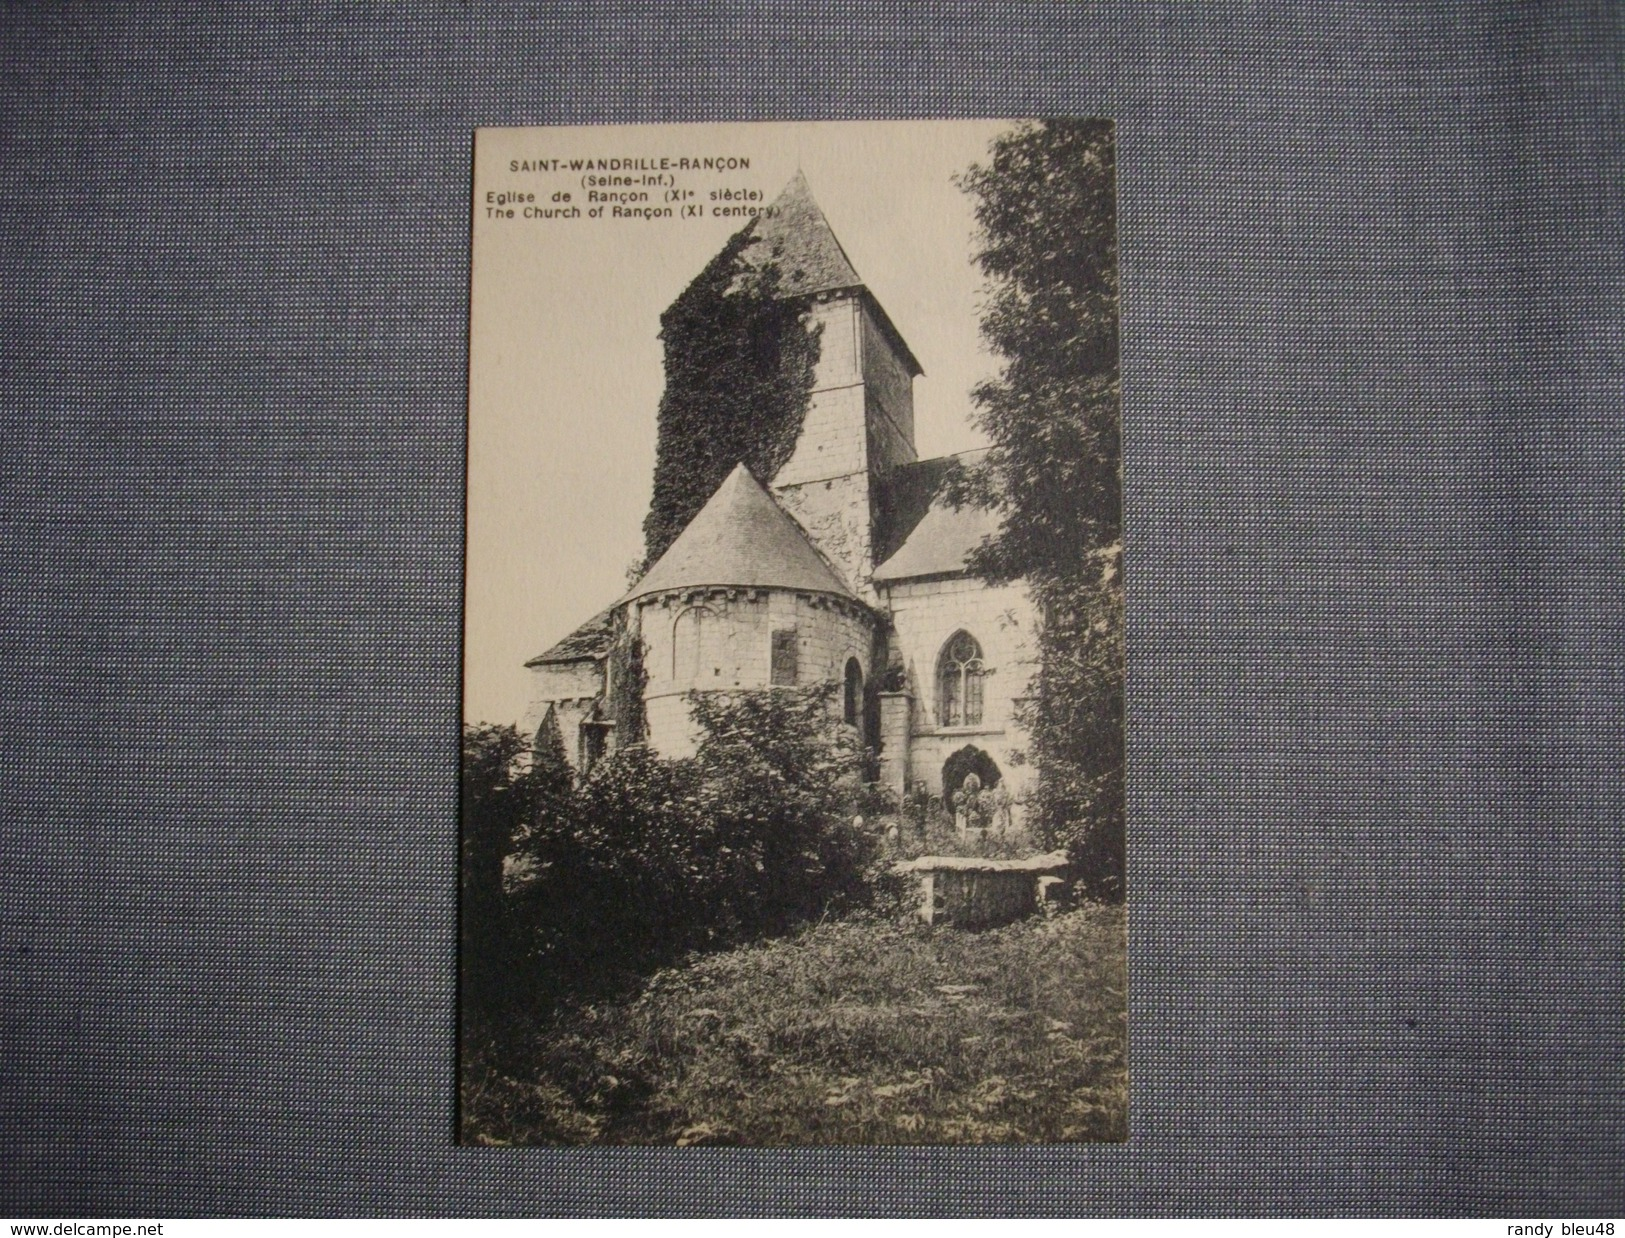 SAINT WANDRILLE RANCON  -  76  -  Eglise De Rancon  -  Seine Maritime - Saint-Wandrille-Rançon